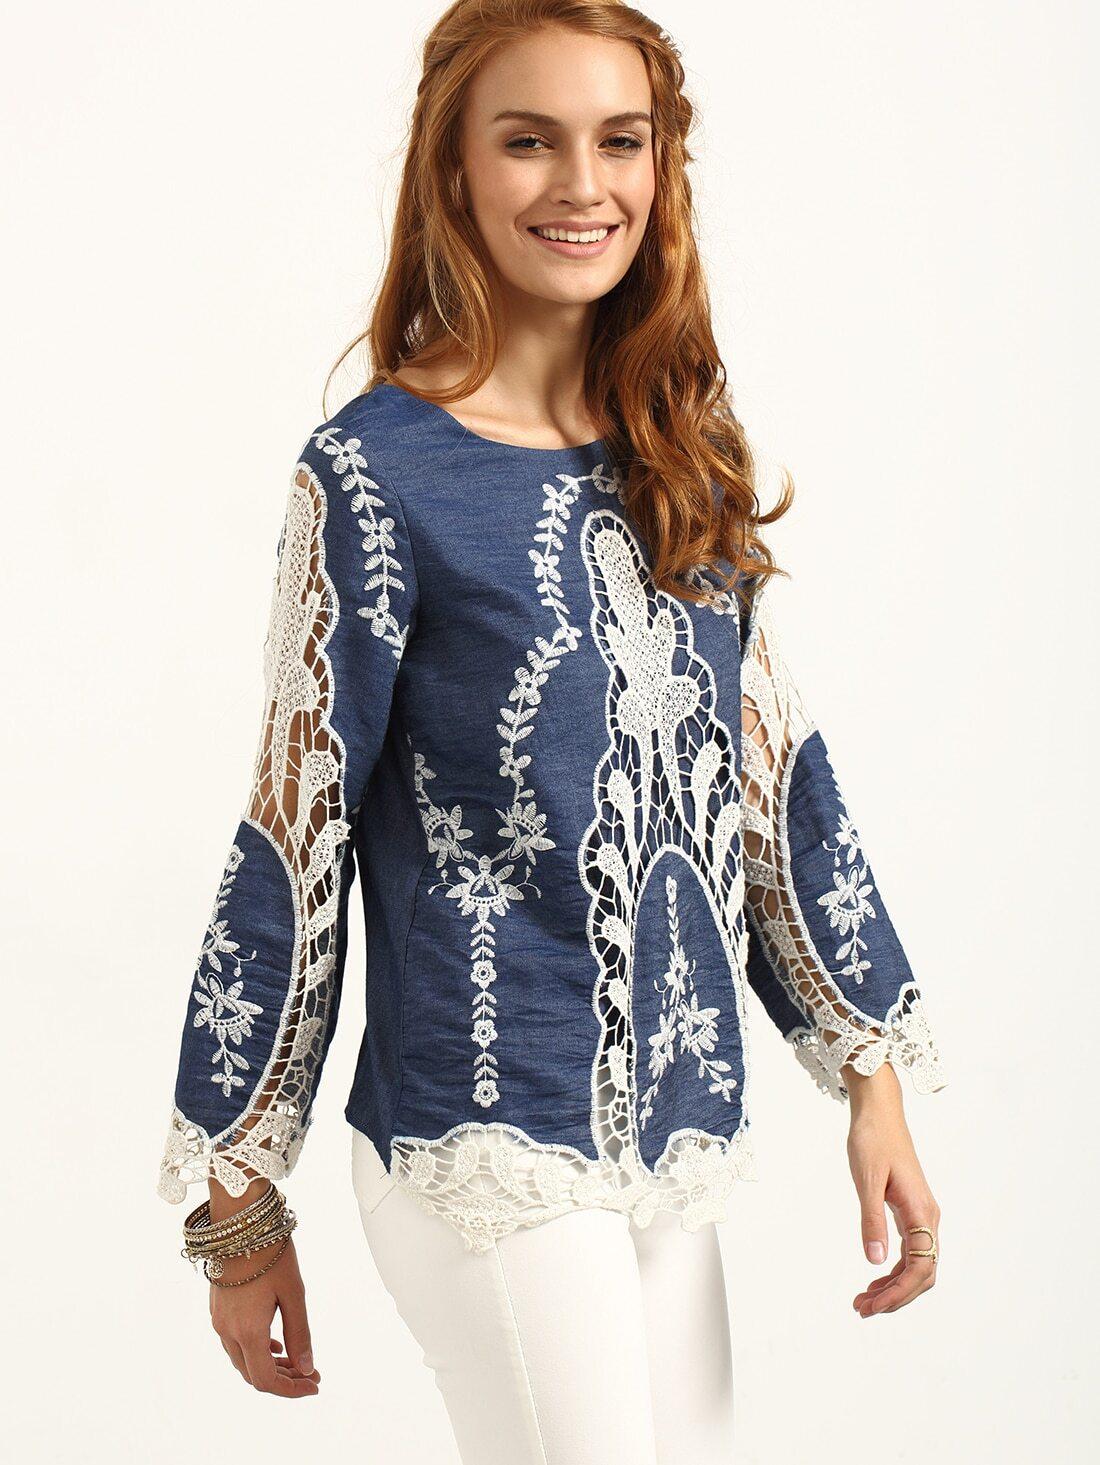 blouse manche longue avec broderie french shein sheinside. Black Bedroom Furniture Sets. Home Design Ideas